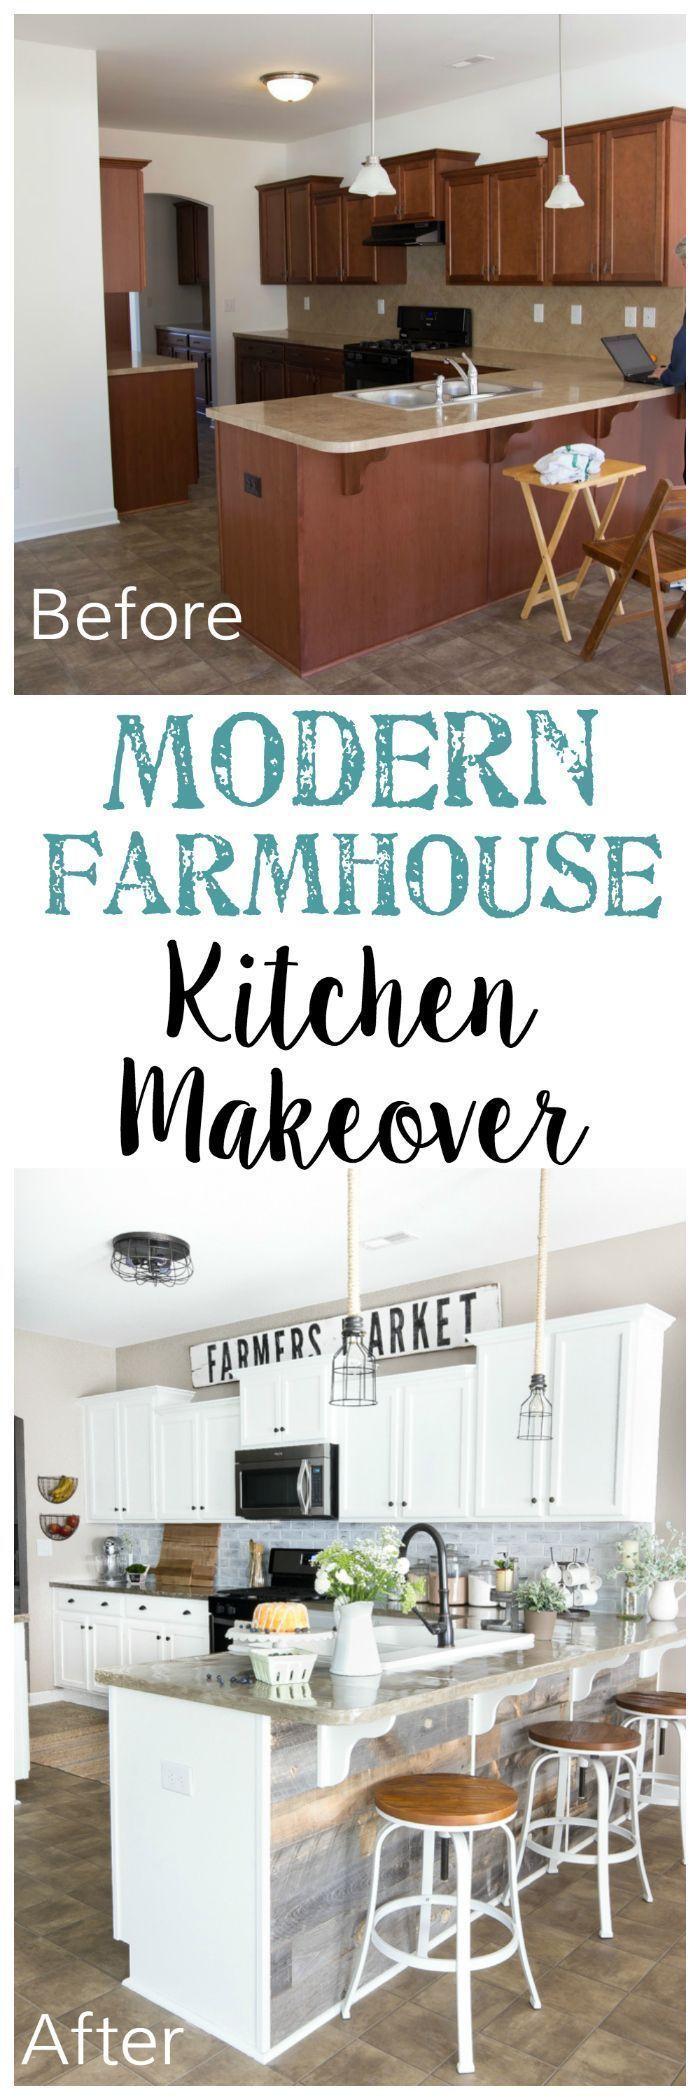 Modern farmhouse kitchen makeover reveal blesserhouse